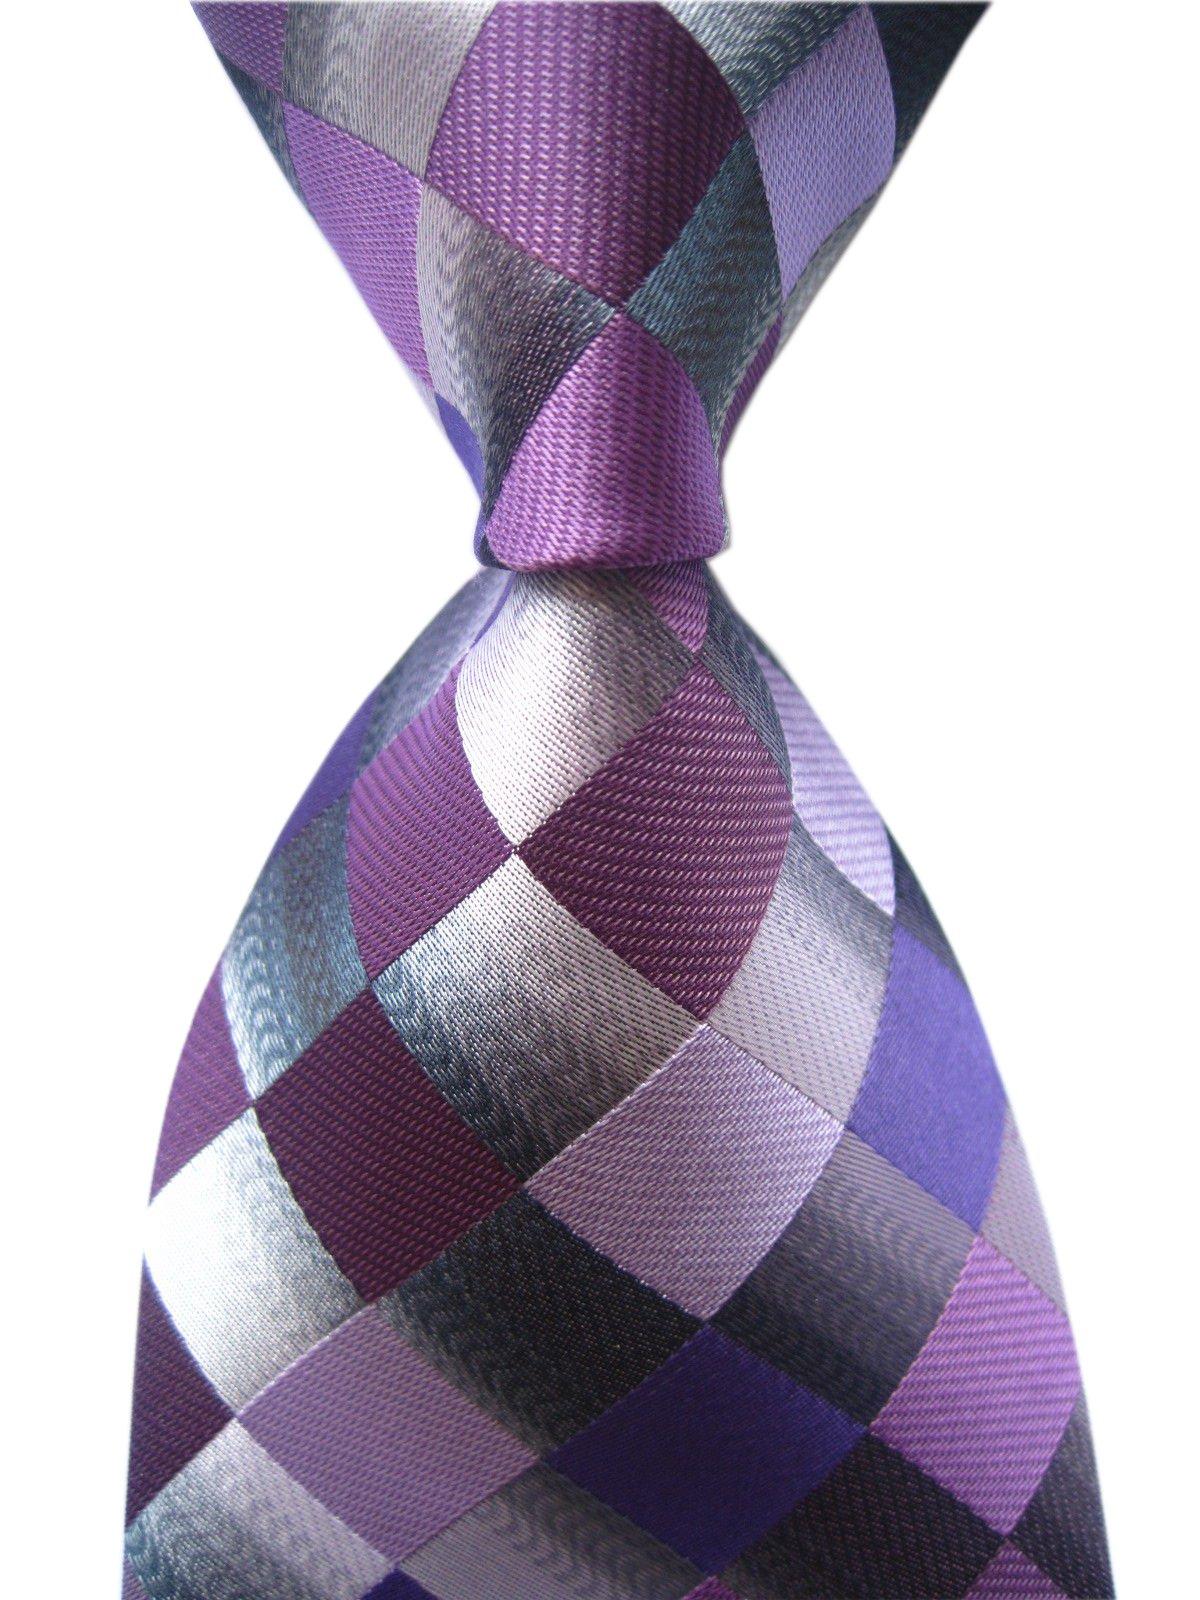 Secdtie Men's Classic Checks Purple Grey Jacquard Woven Silk Tie Necktie